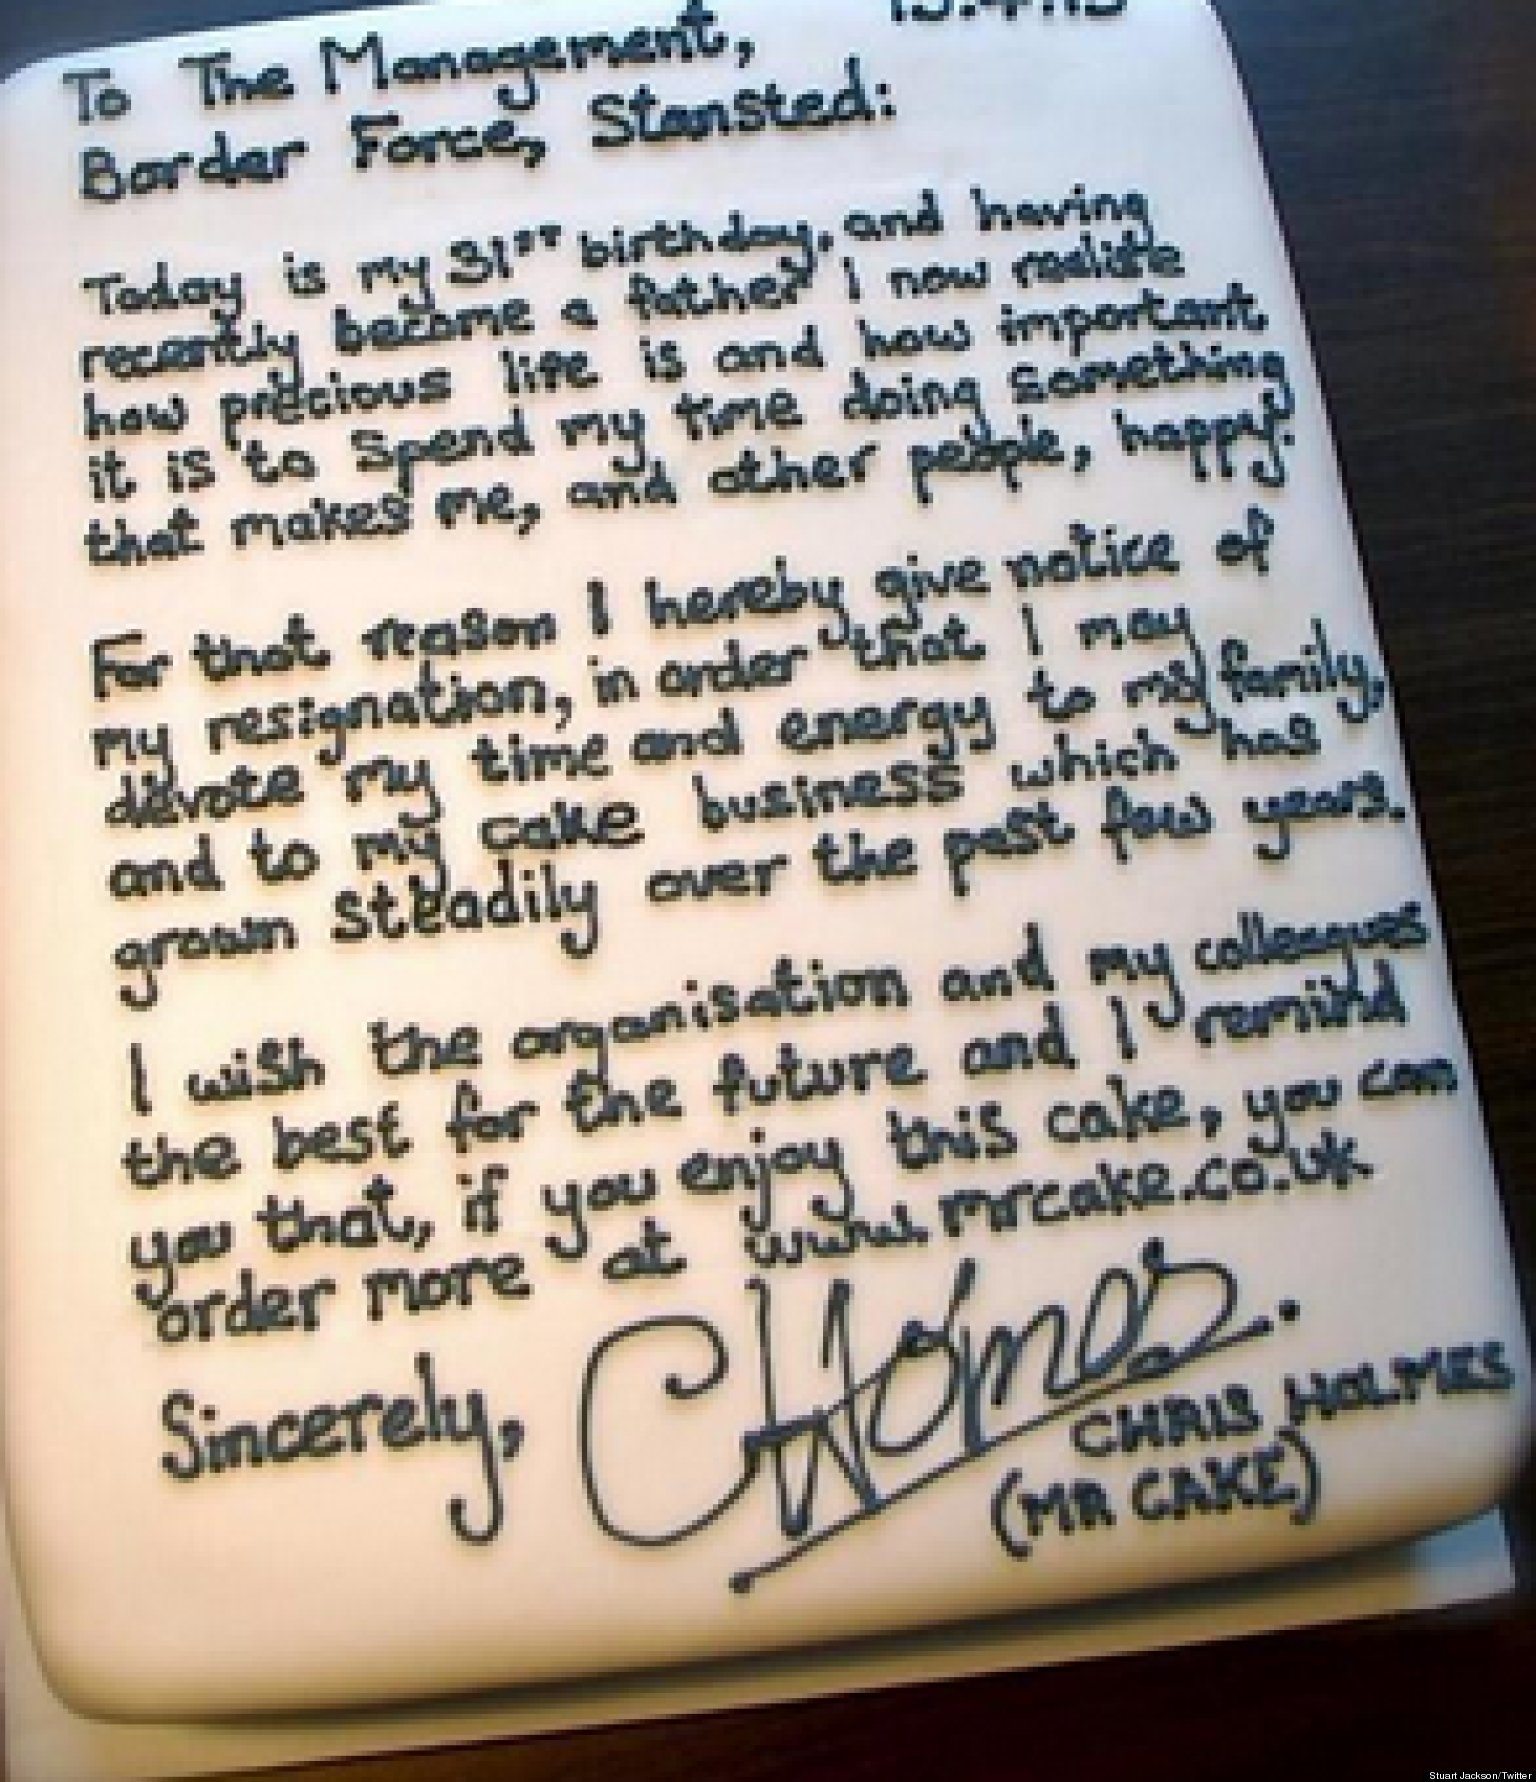 resignation letter on a cake